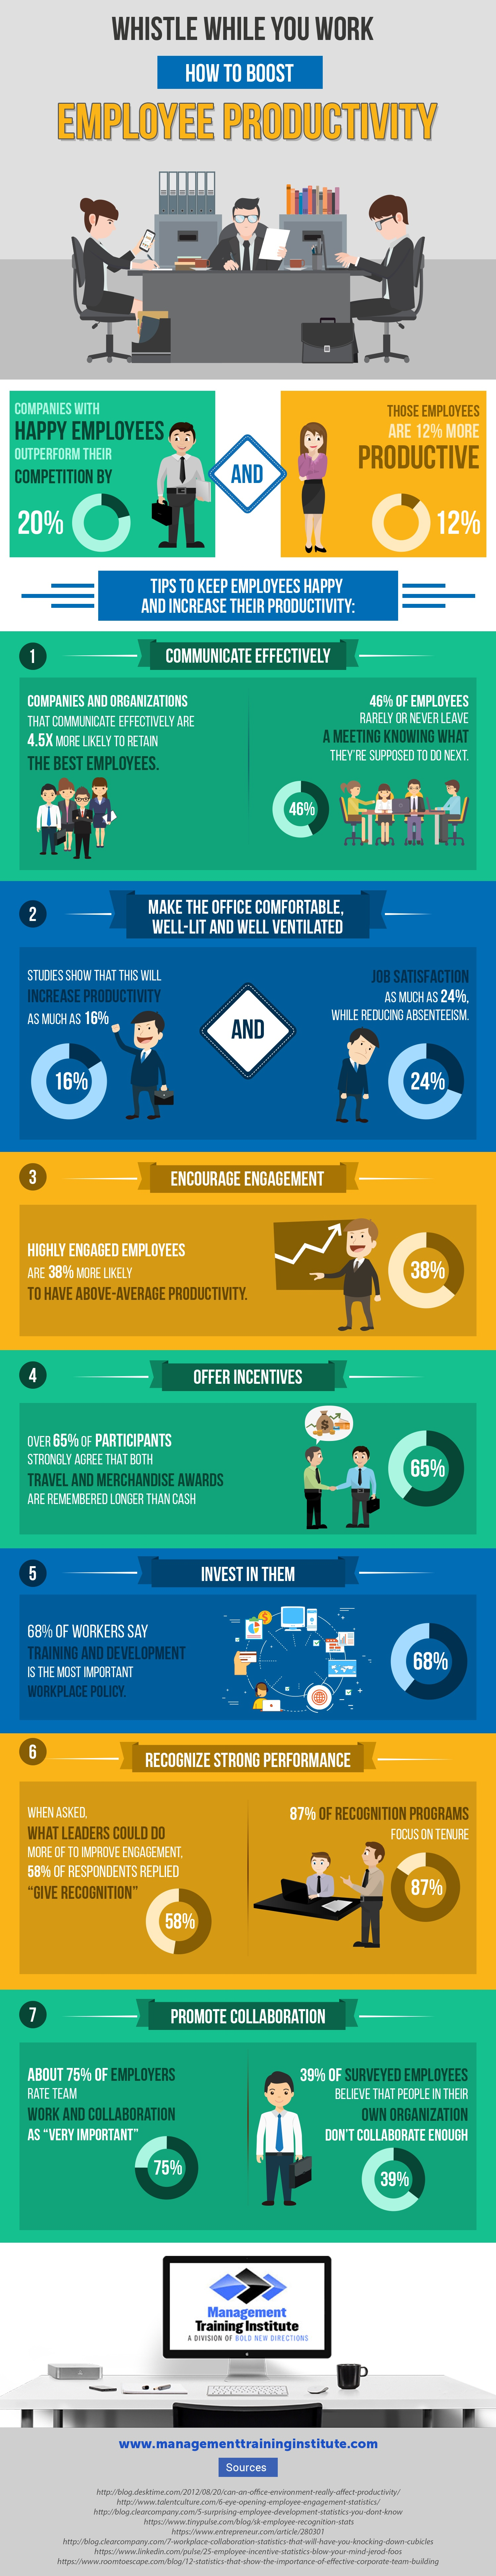 Employee Productivity Infographic